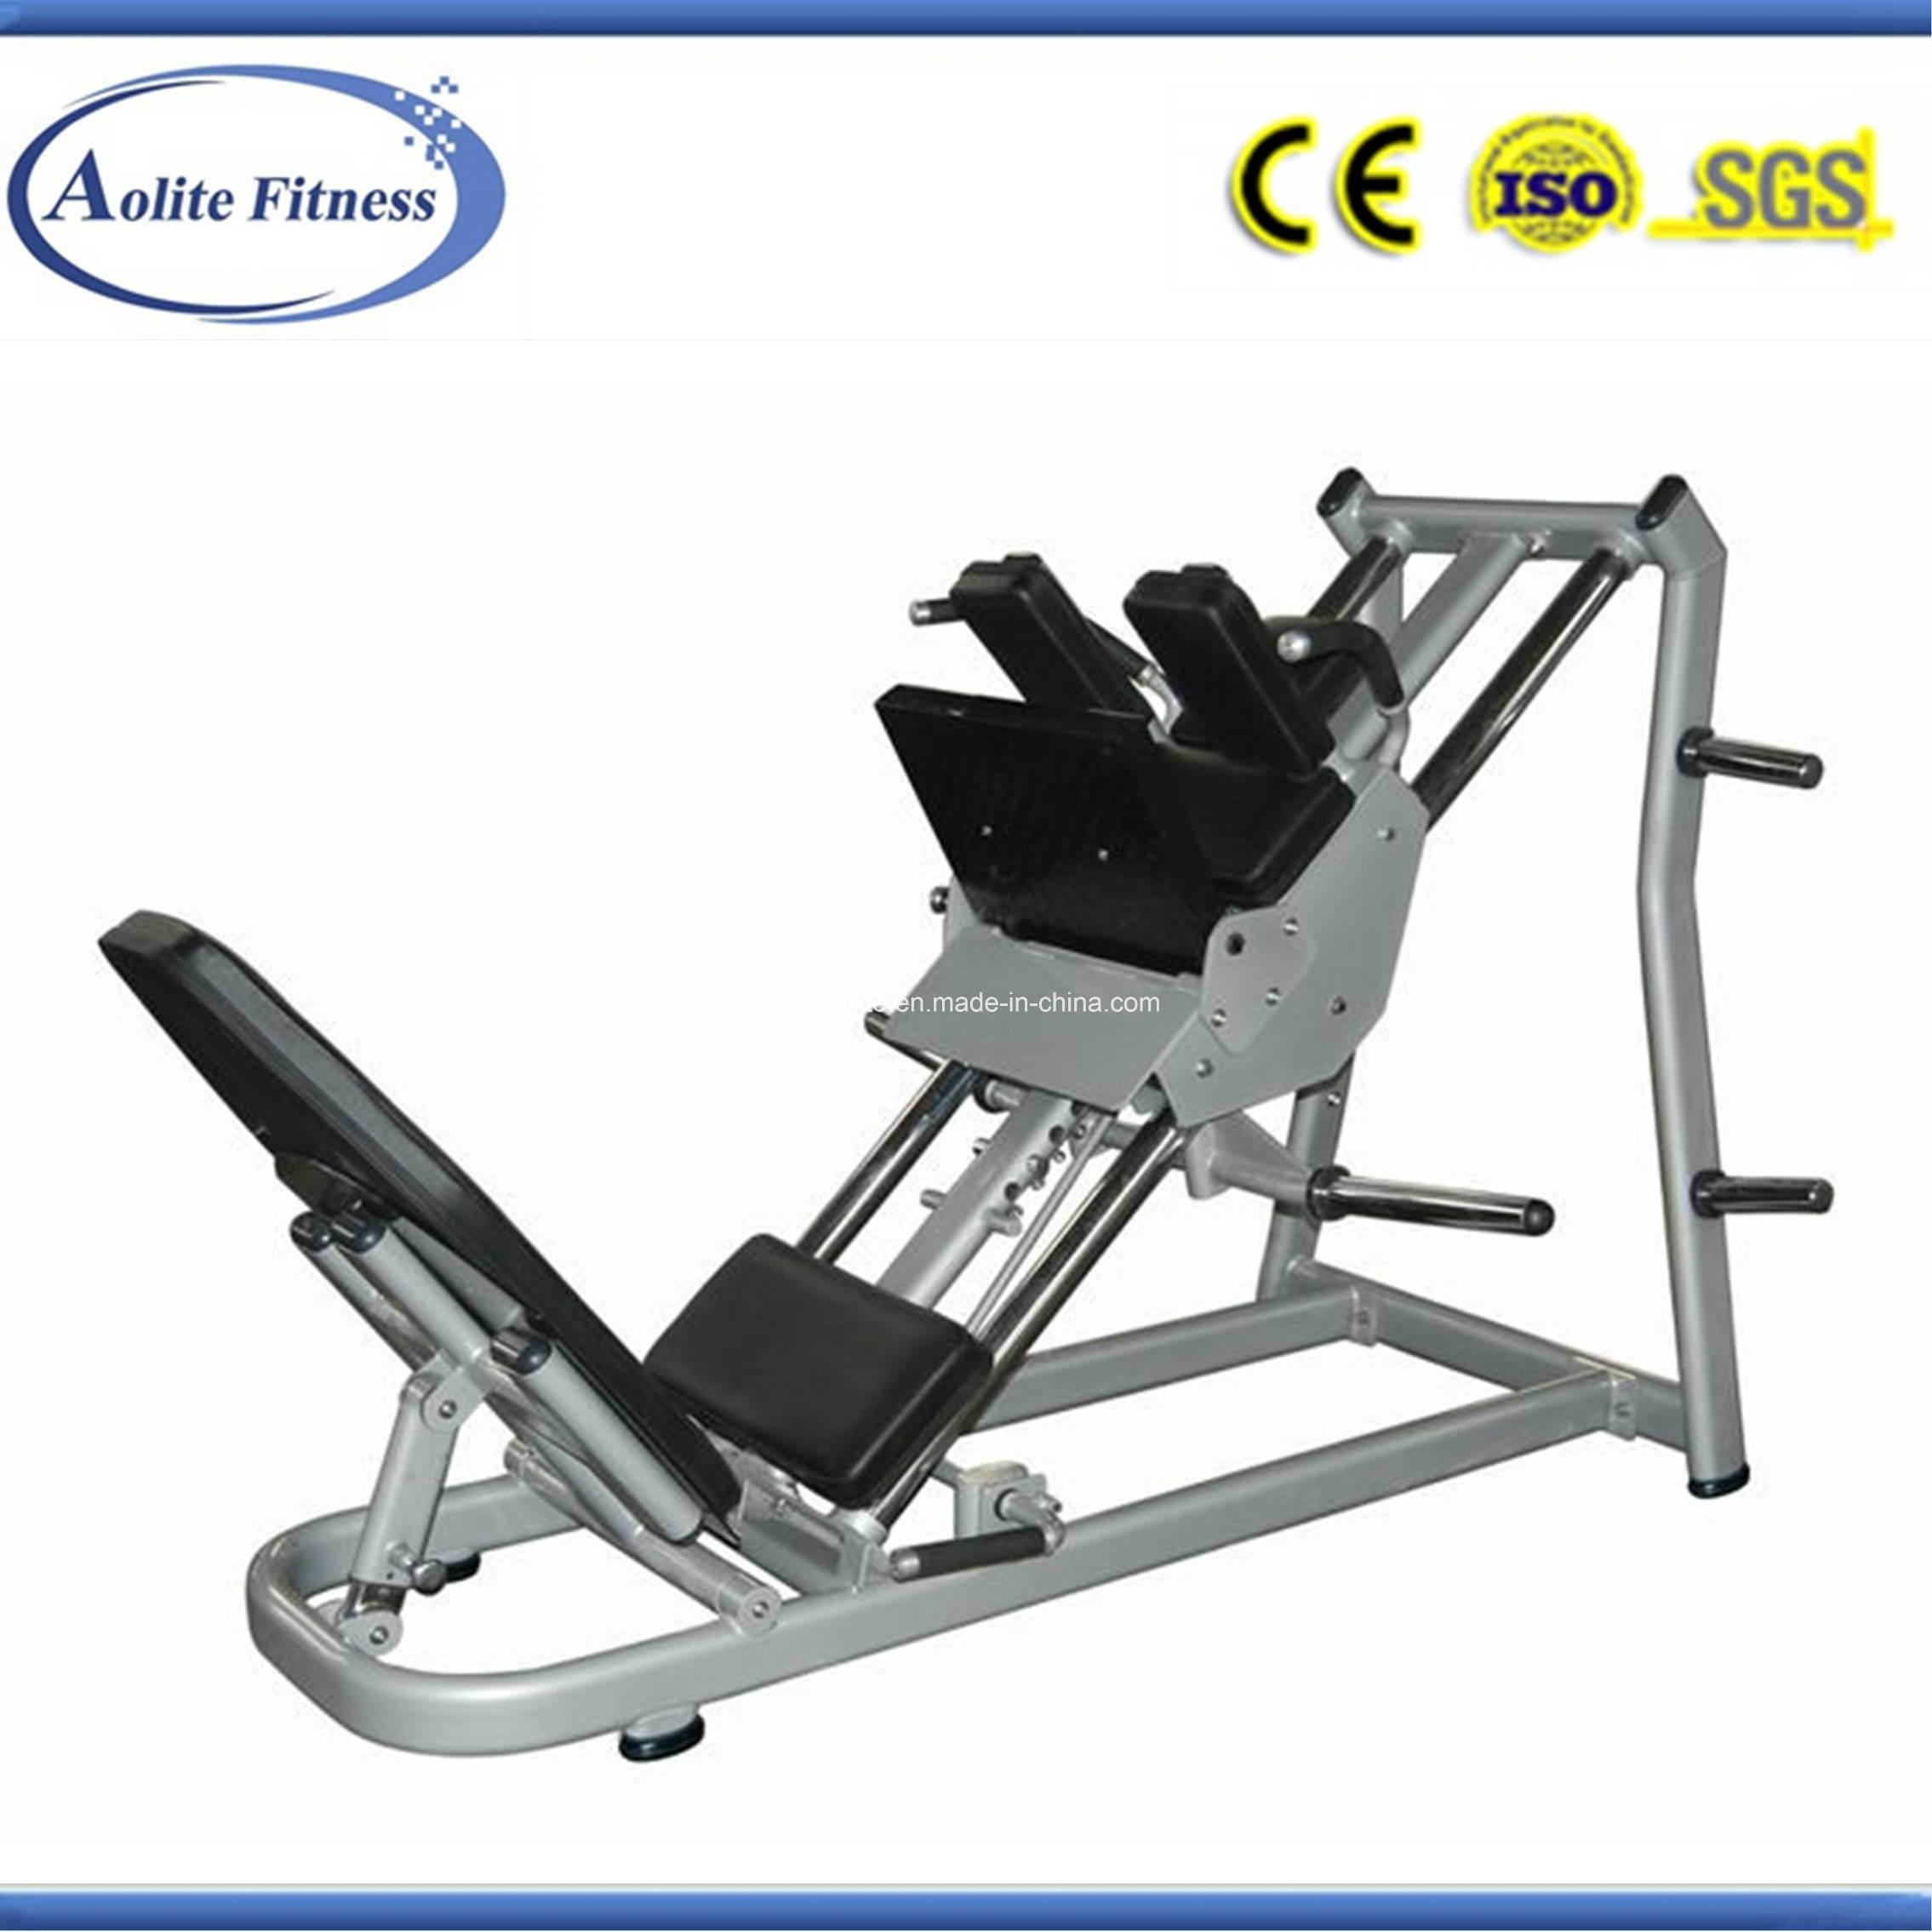 Leg Press Hack Squat Commercial Exercise Gymtraining Equipment for Wholesale